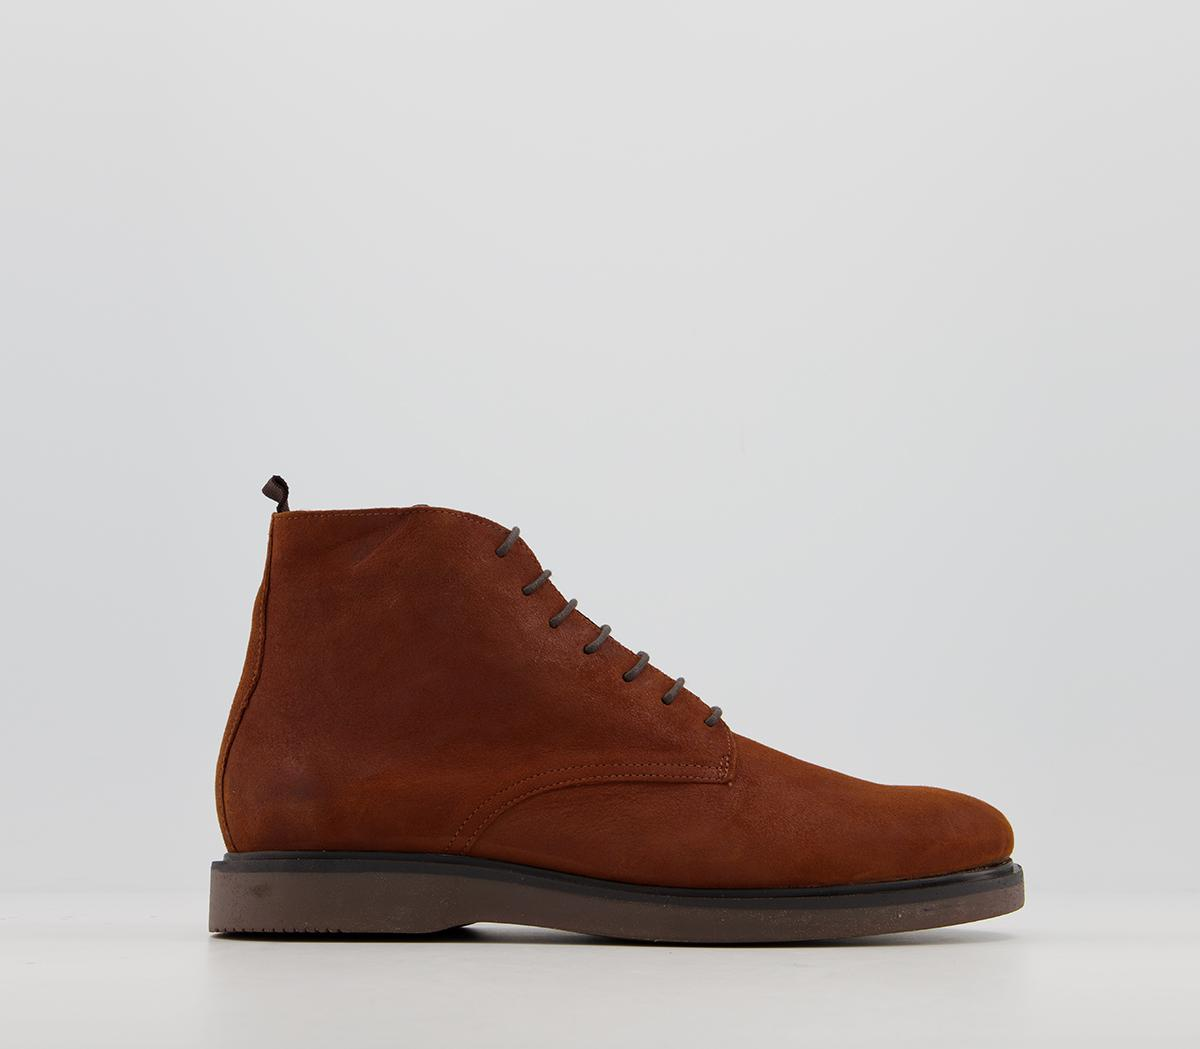 Troy Cali Wax Boots